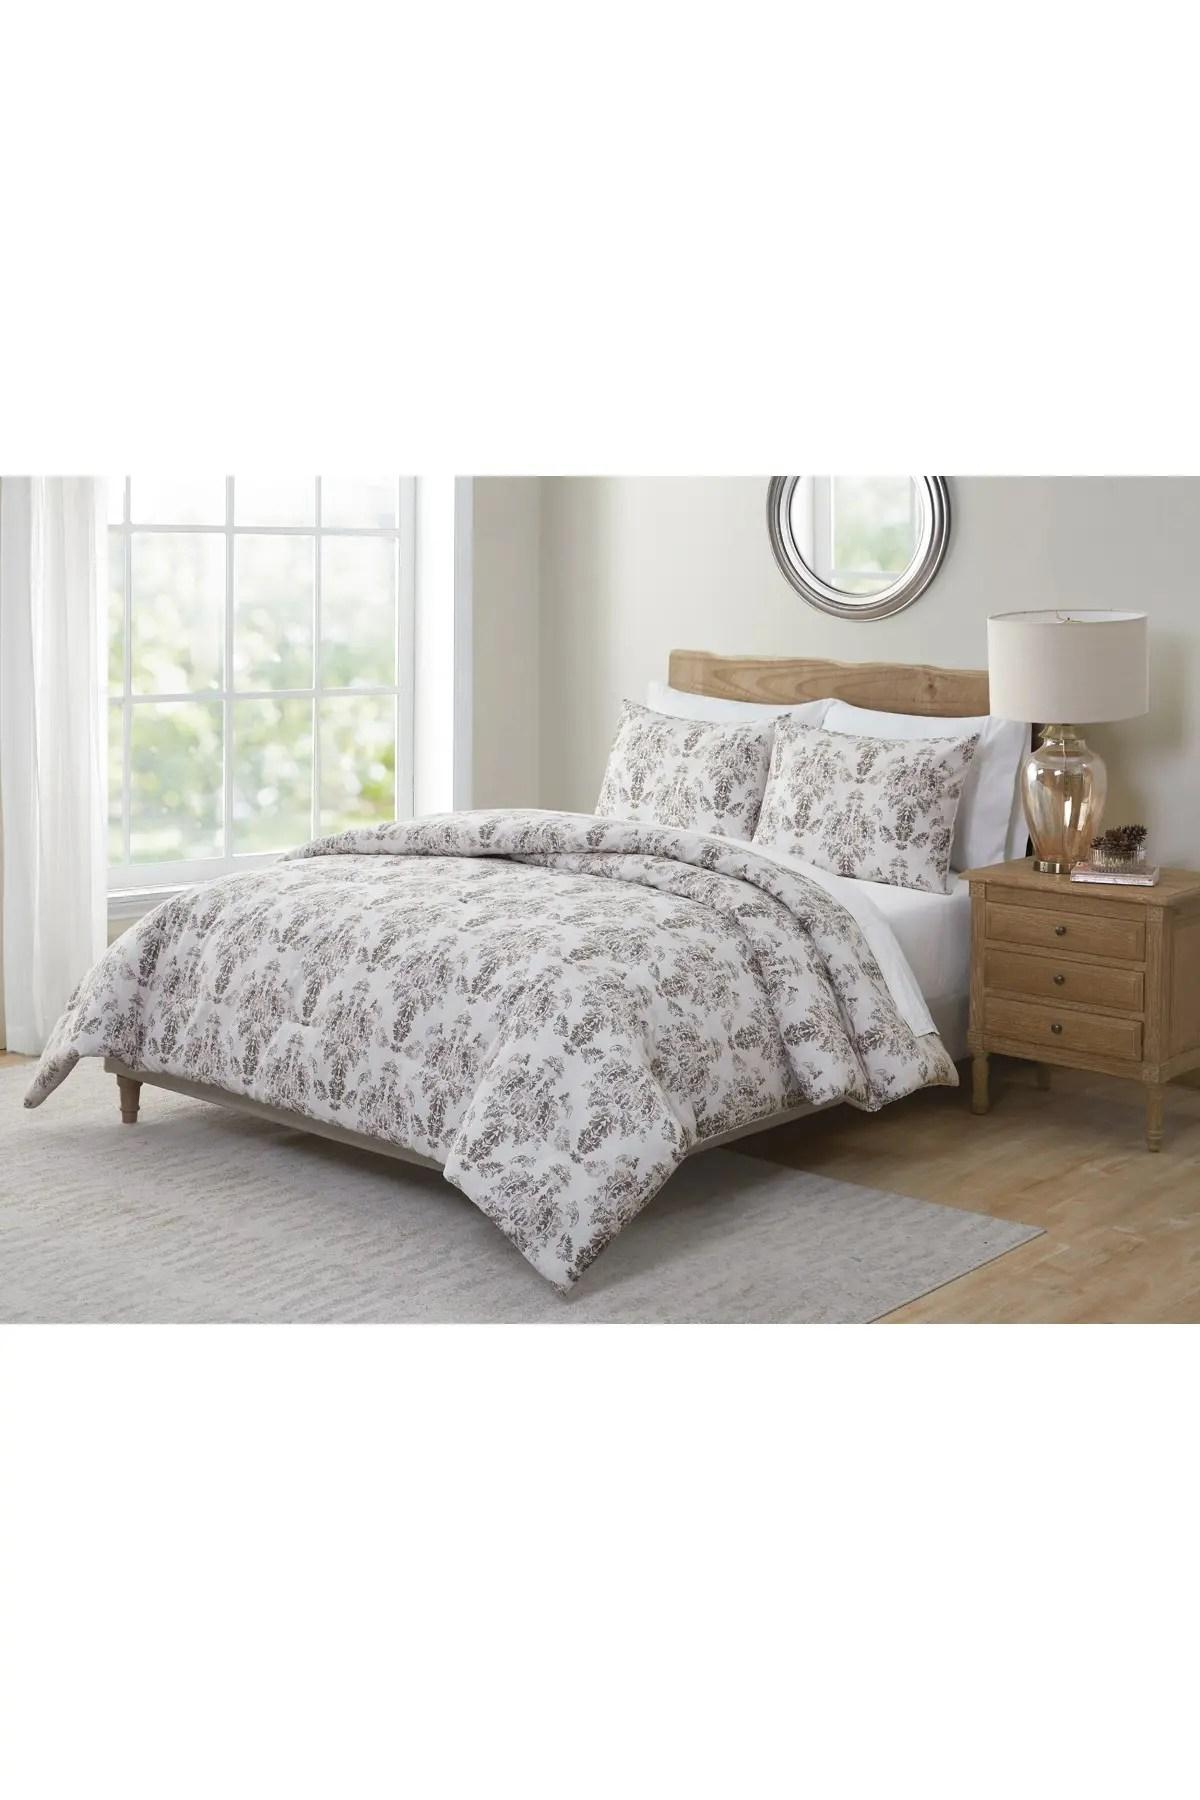 vcny home tahari marla damask 3 piece comforter set taupe king nordstrom rack